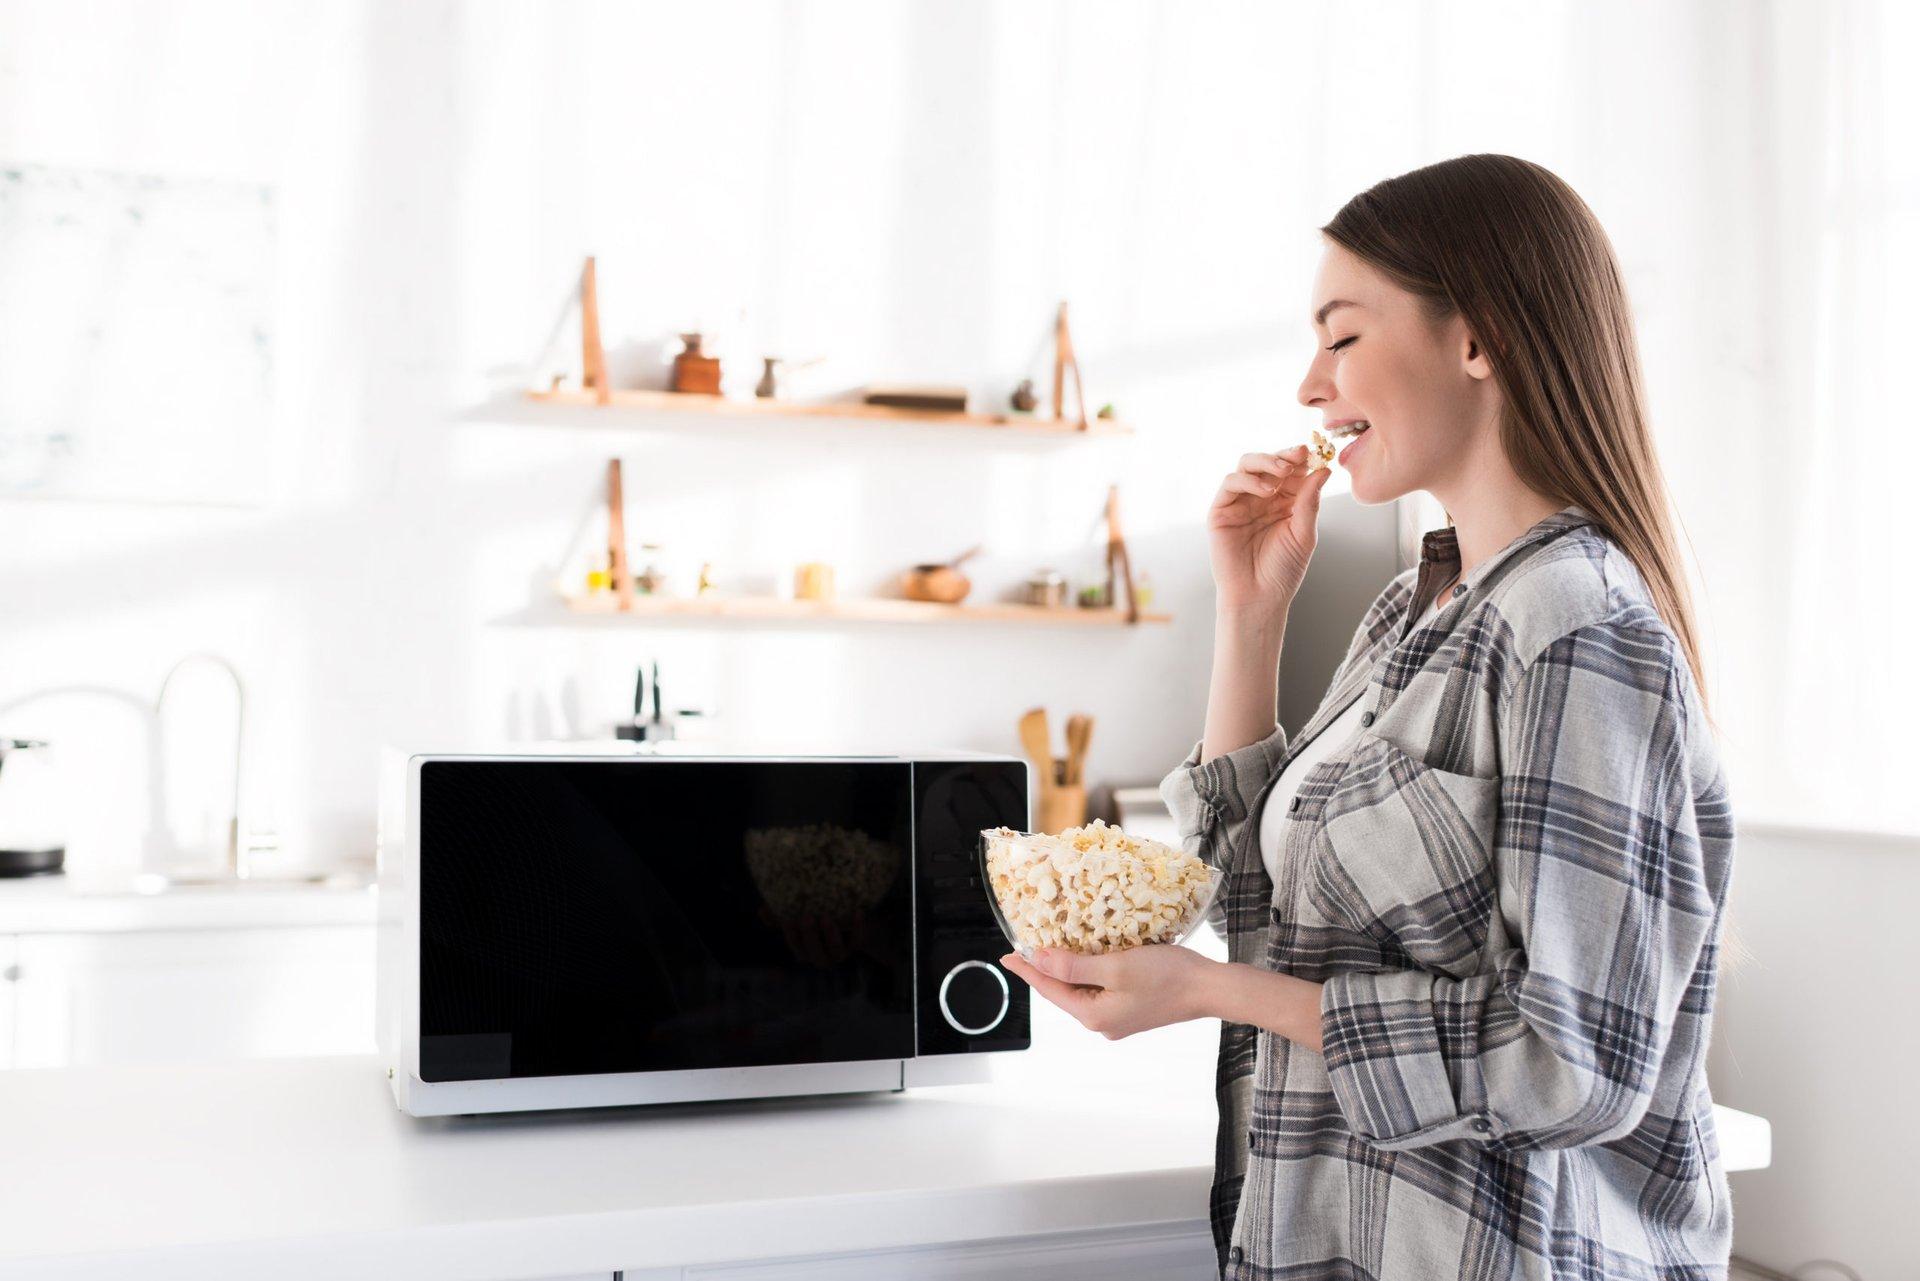 Eating microwave popcorn